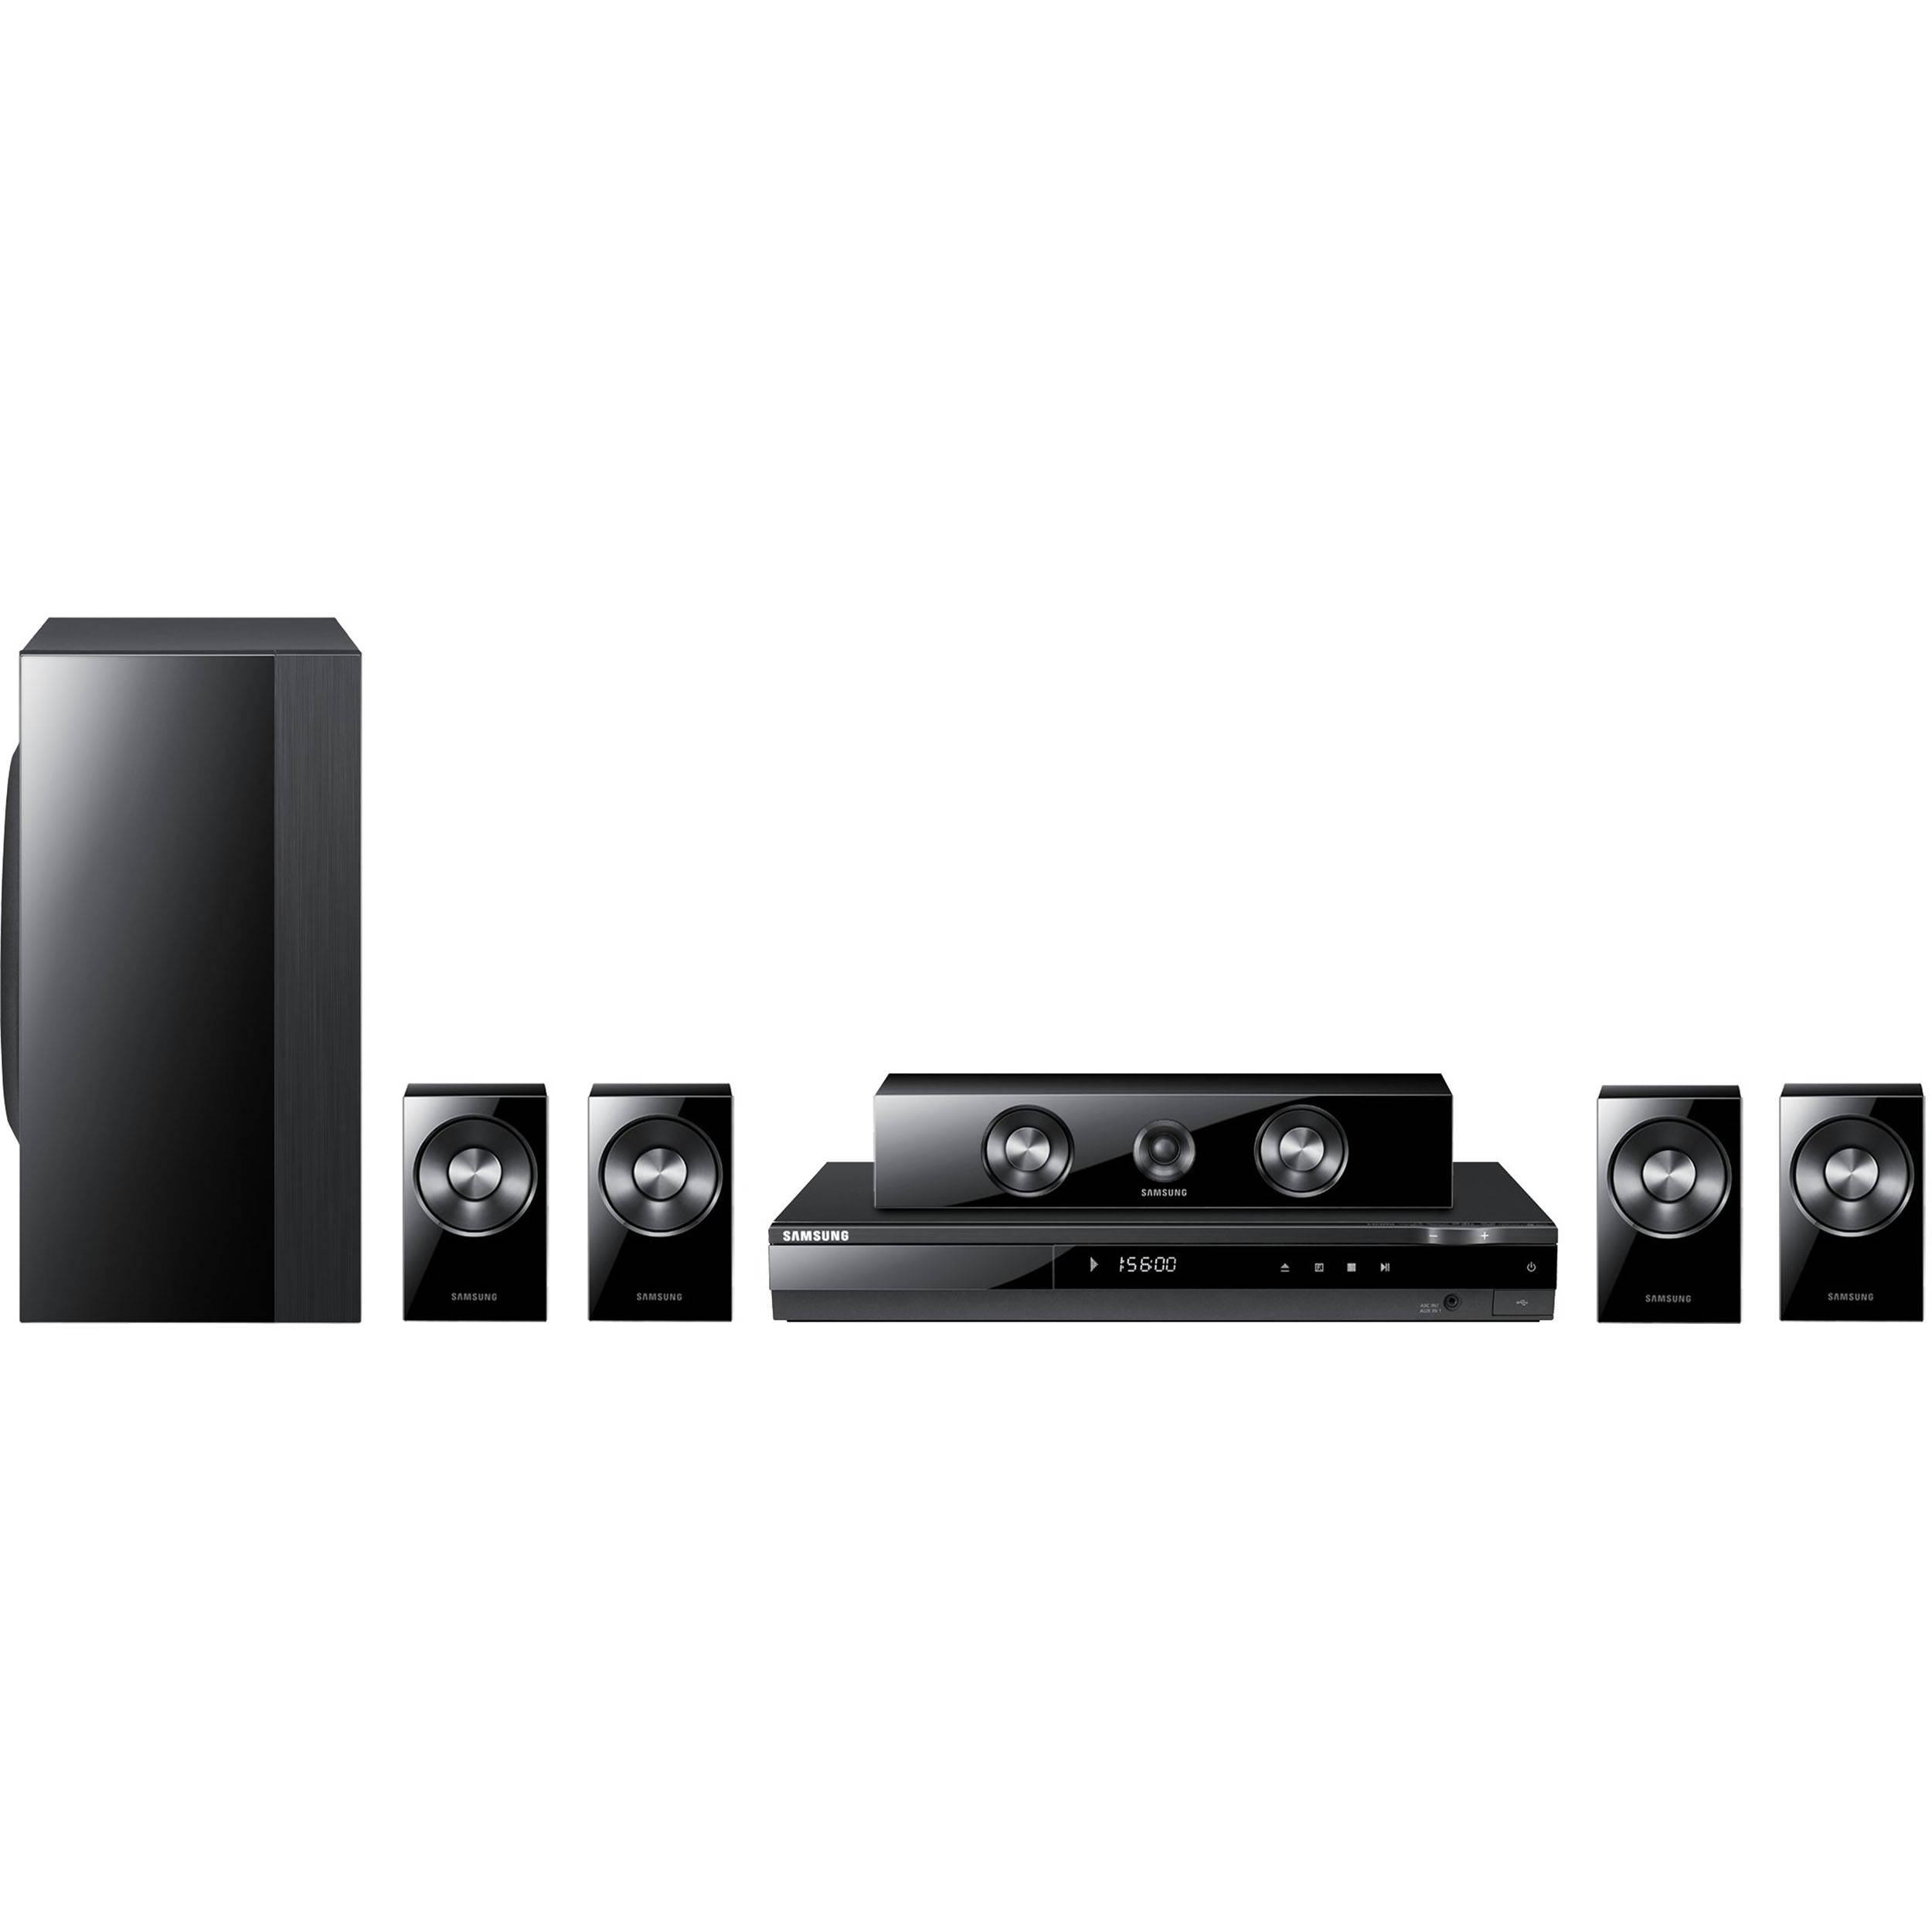 samsung ht d550 home theater system ht d550 b h photo video. Black Bedroom Furniture Sets. Home Design Ideas